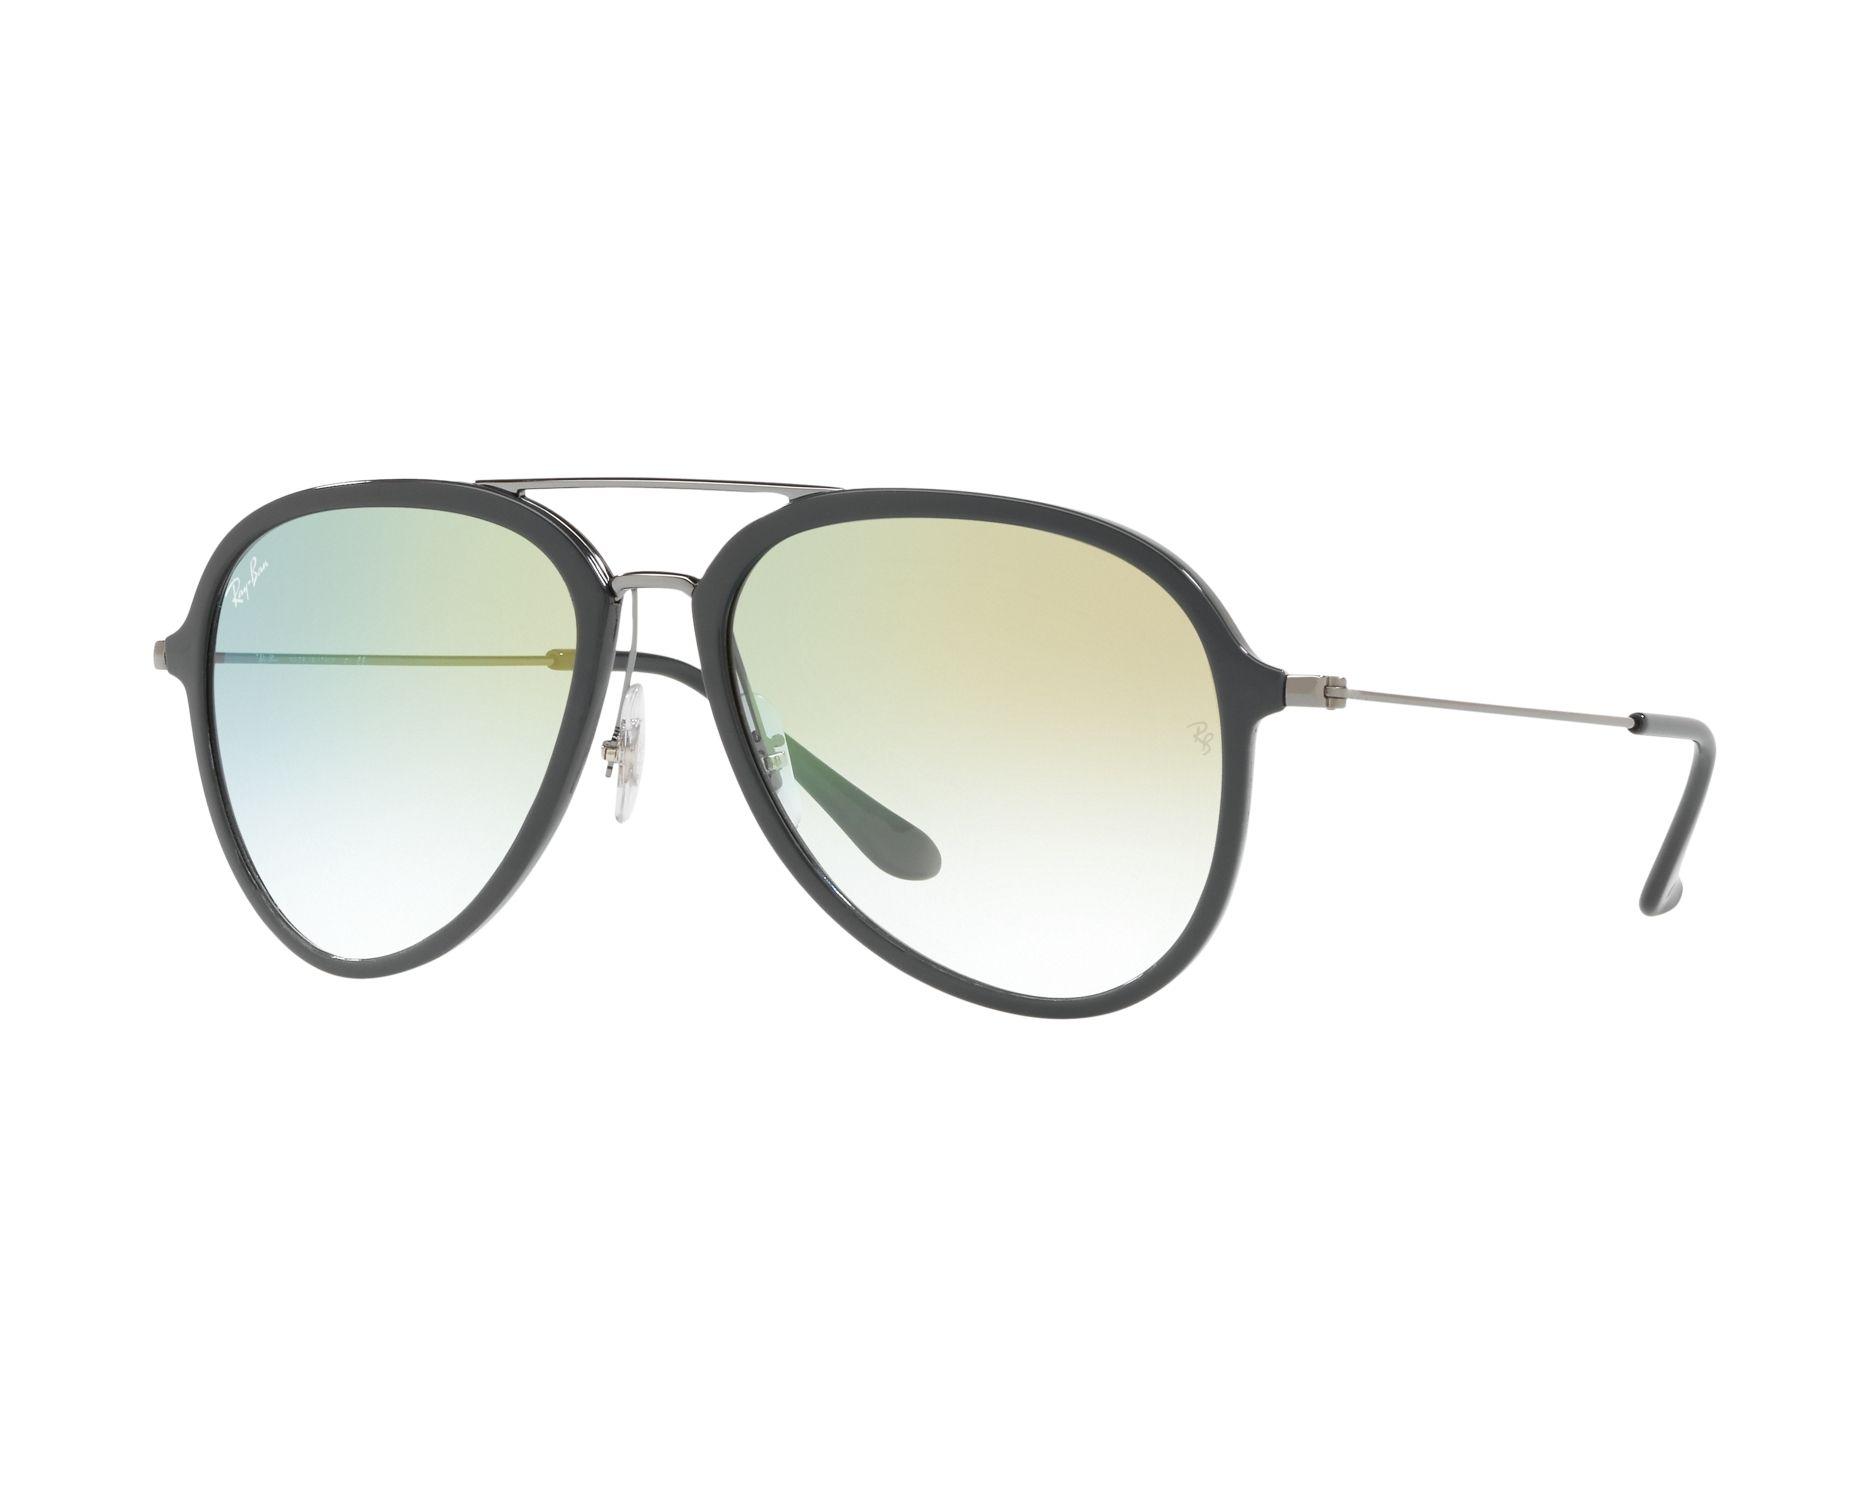 772a662e4d Sunglasses Ray-Ban RB-4298 6333Y0 57-17 Grey Gun